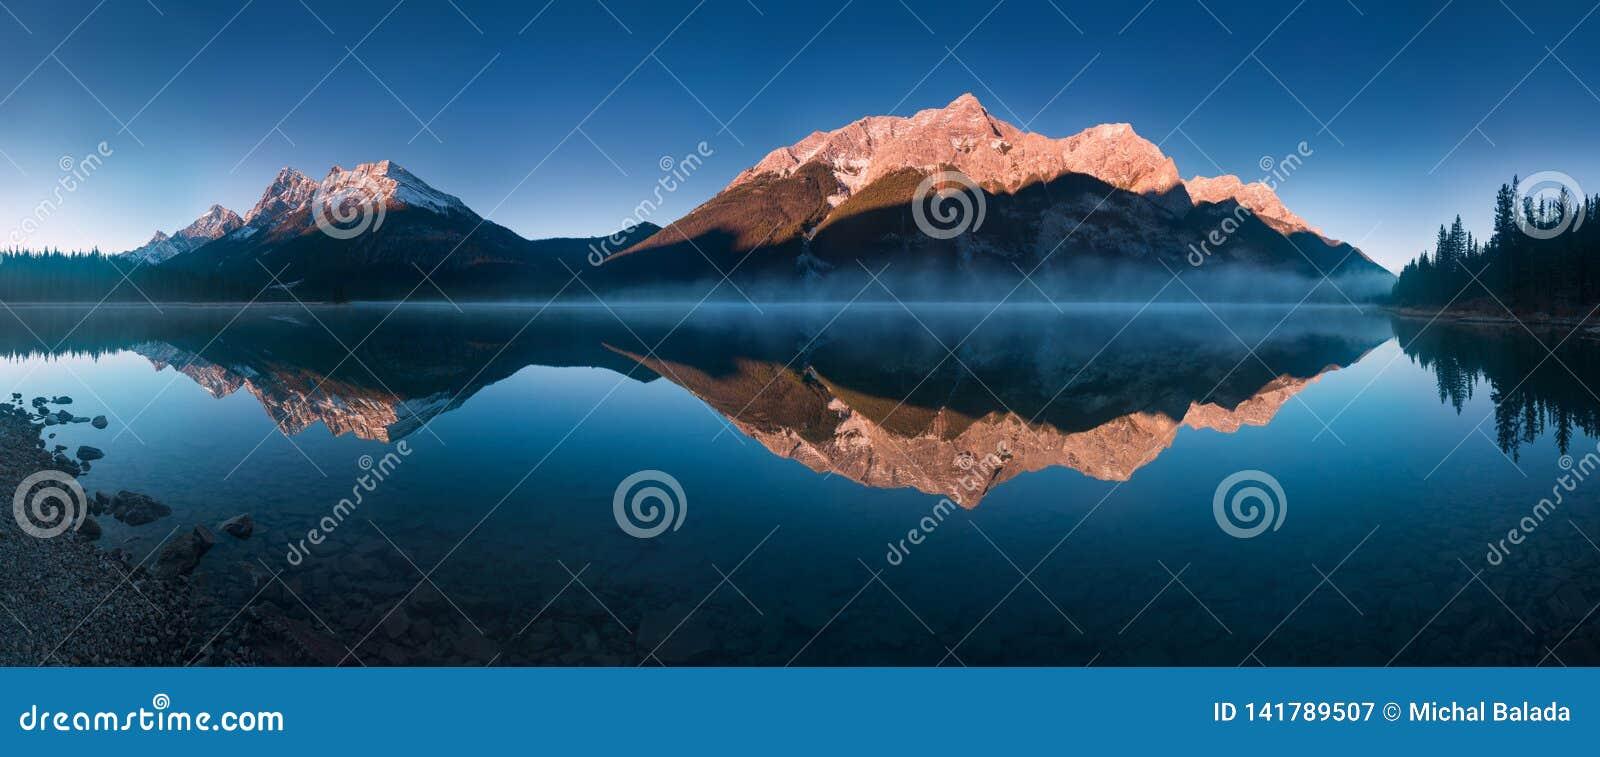 Serene sunrise at the Spray Lakes Reservoir is a reservoir in Alberta, Canada. The Spray Lakes